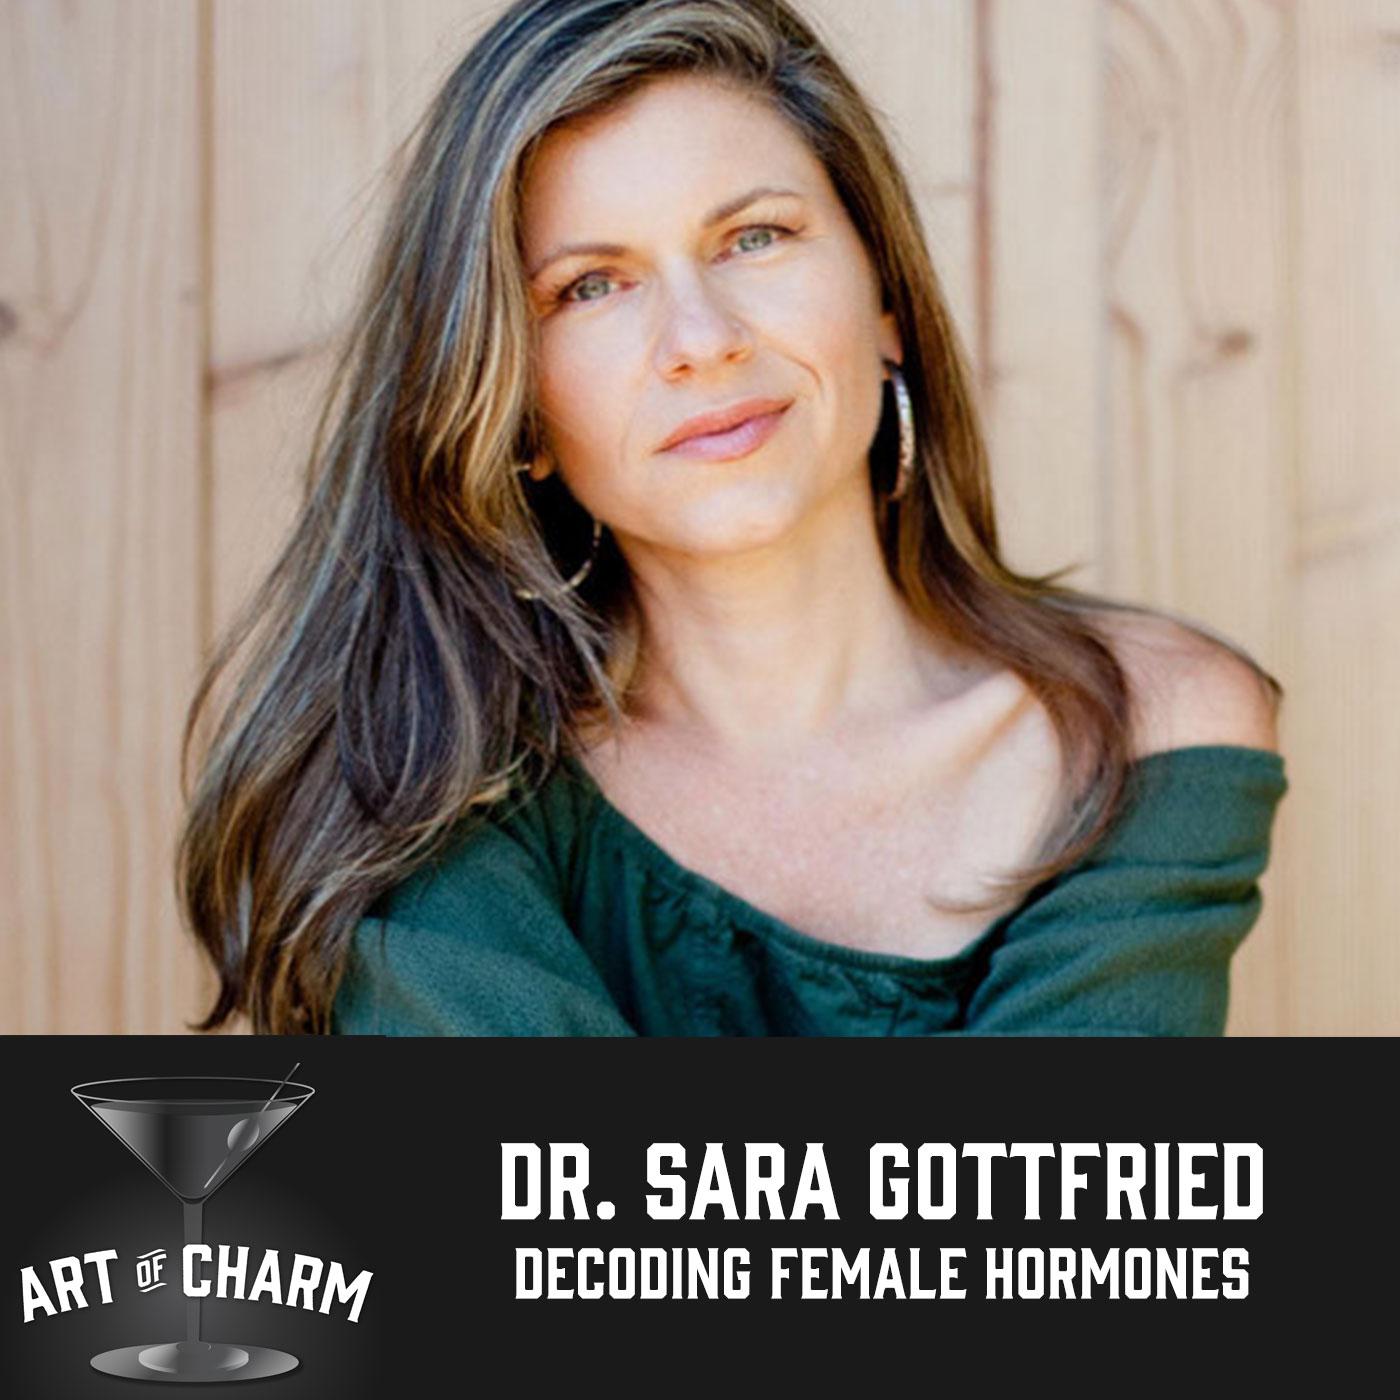 Sara gottfried podcast